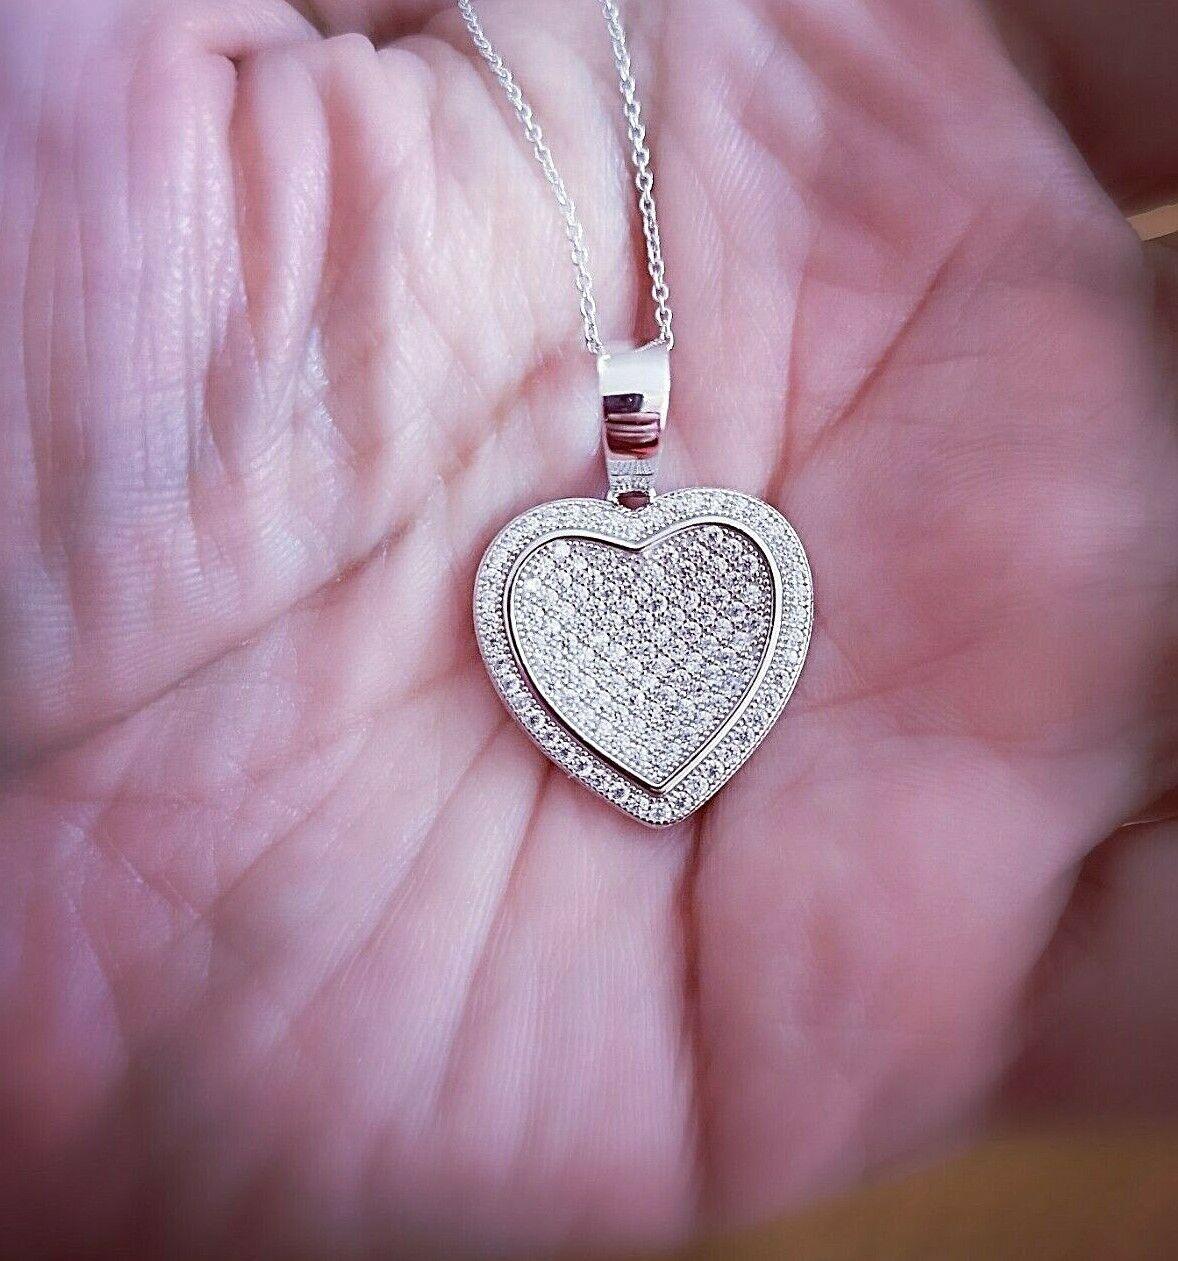 1 Ct Diamond pendant with Chain Woman's Heart Diamond Necklace 14K White Gold